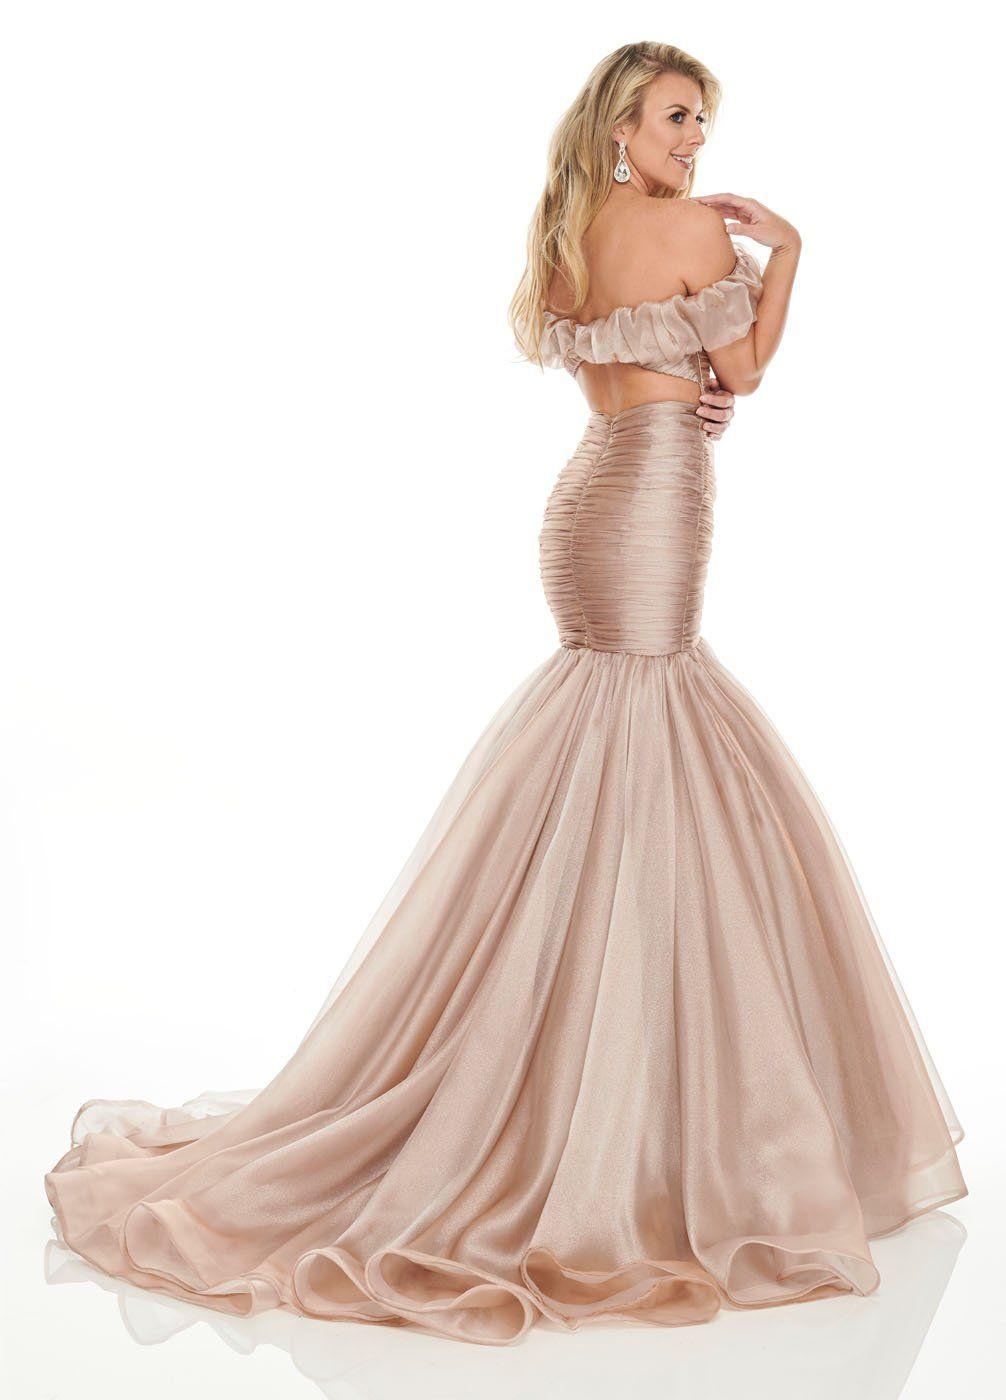 Rachel Allan 8430 Dress Prom Dress Stores Dresses Designer Prom Dresses [ 1400 x 1006 Pixel ]